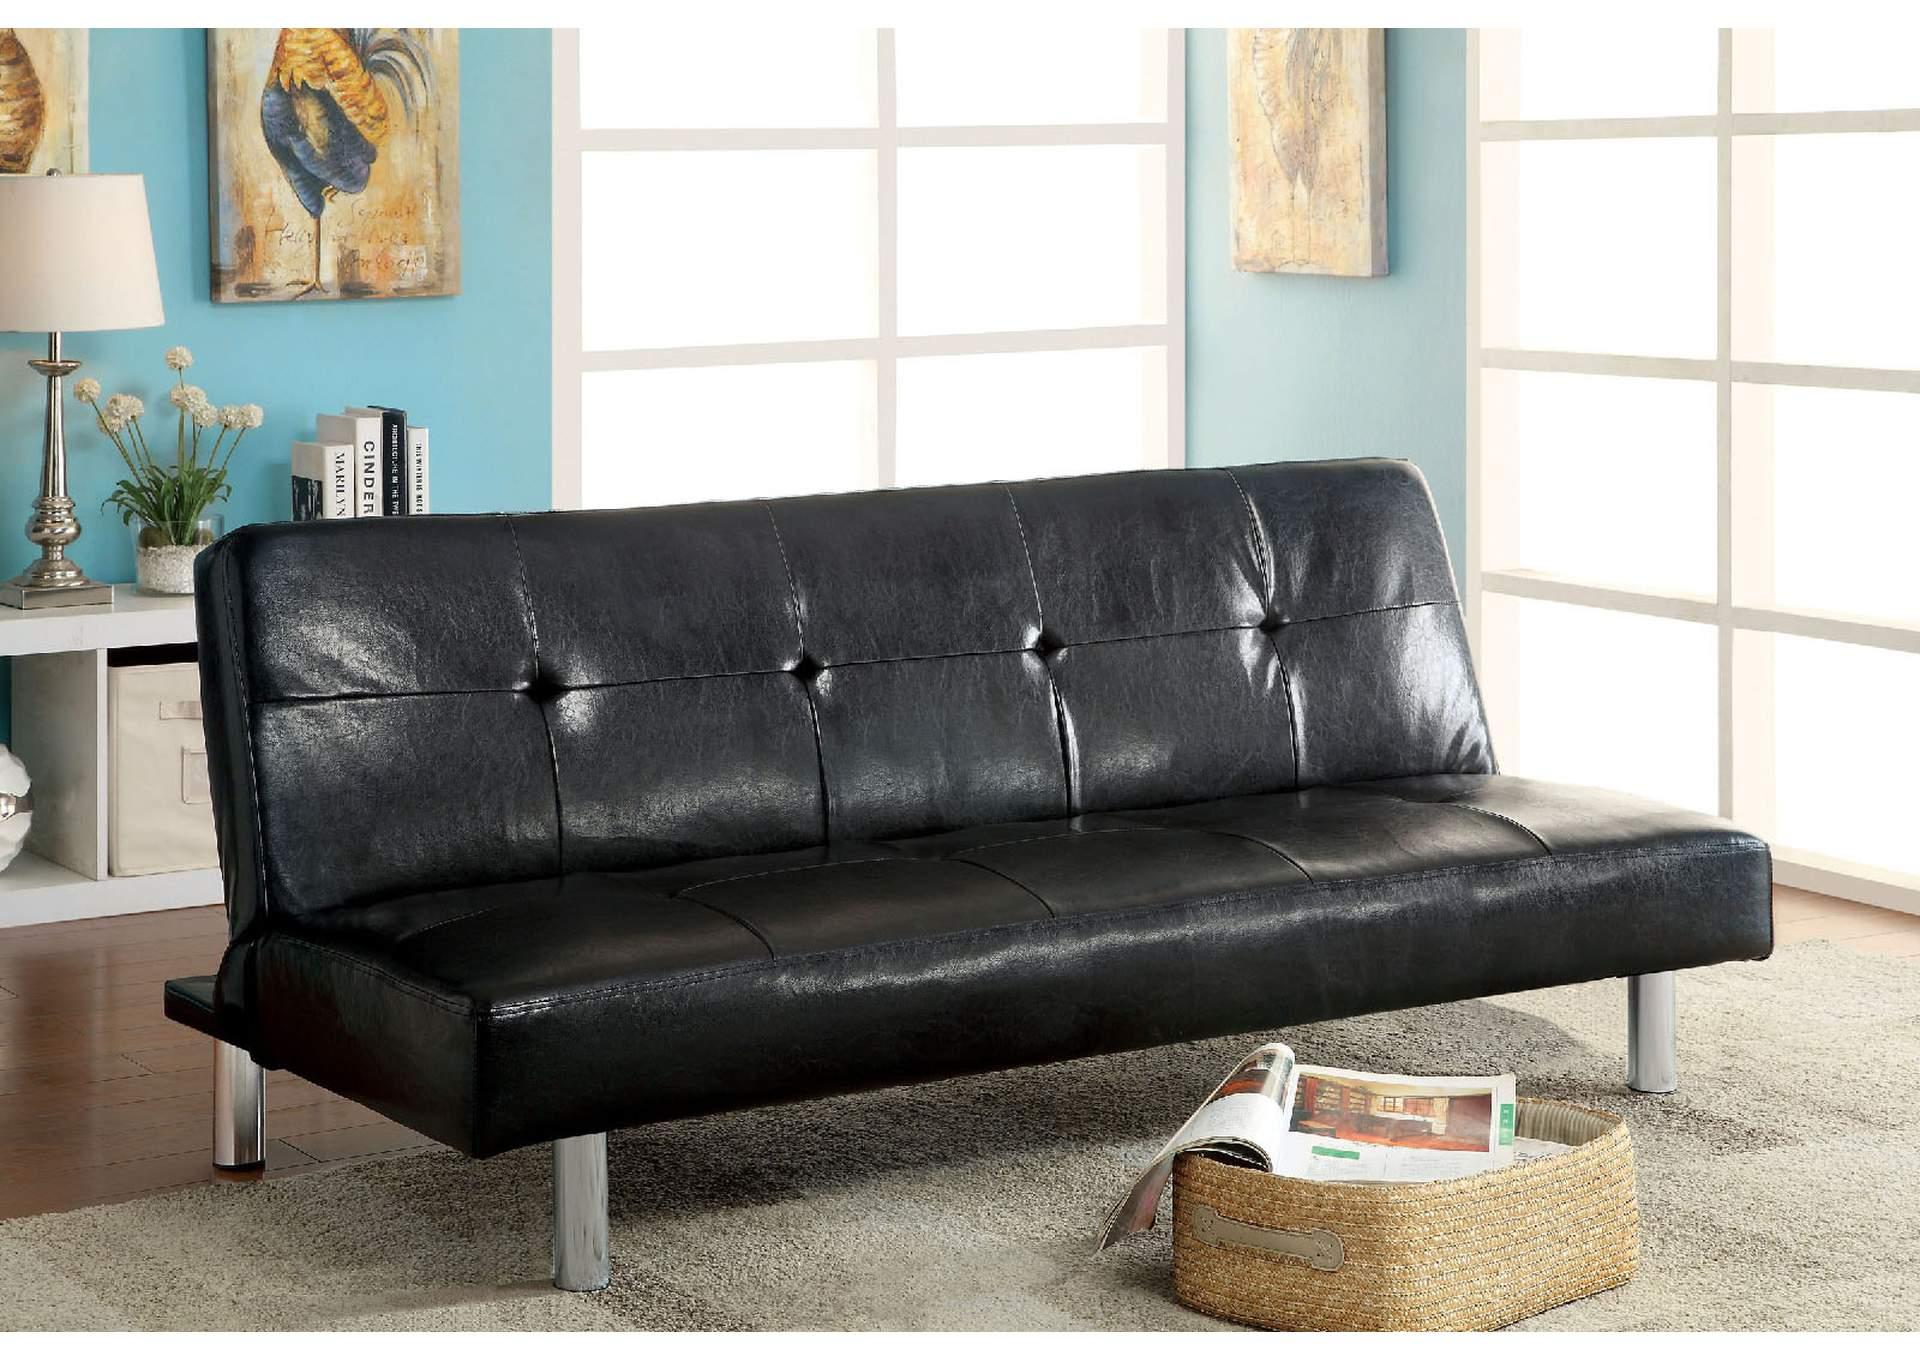 Eddi Black Leatherette Futon Sofa